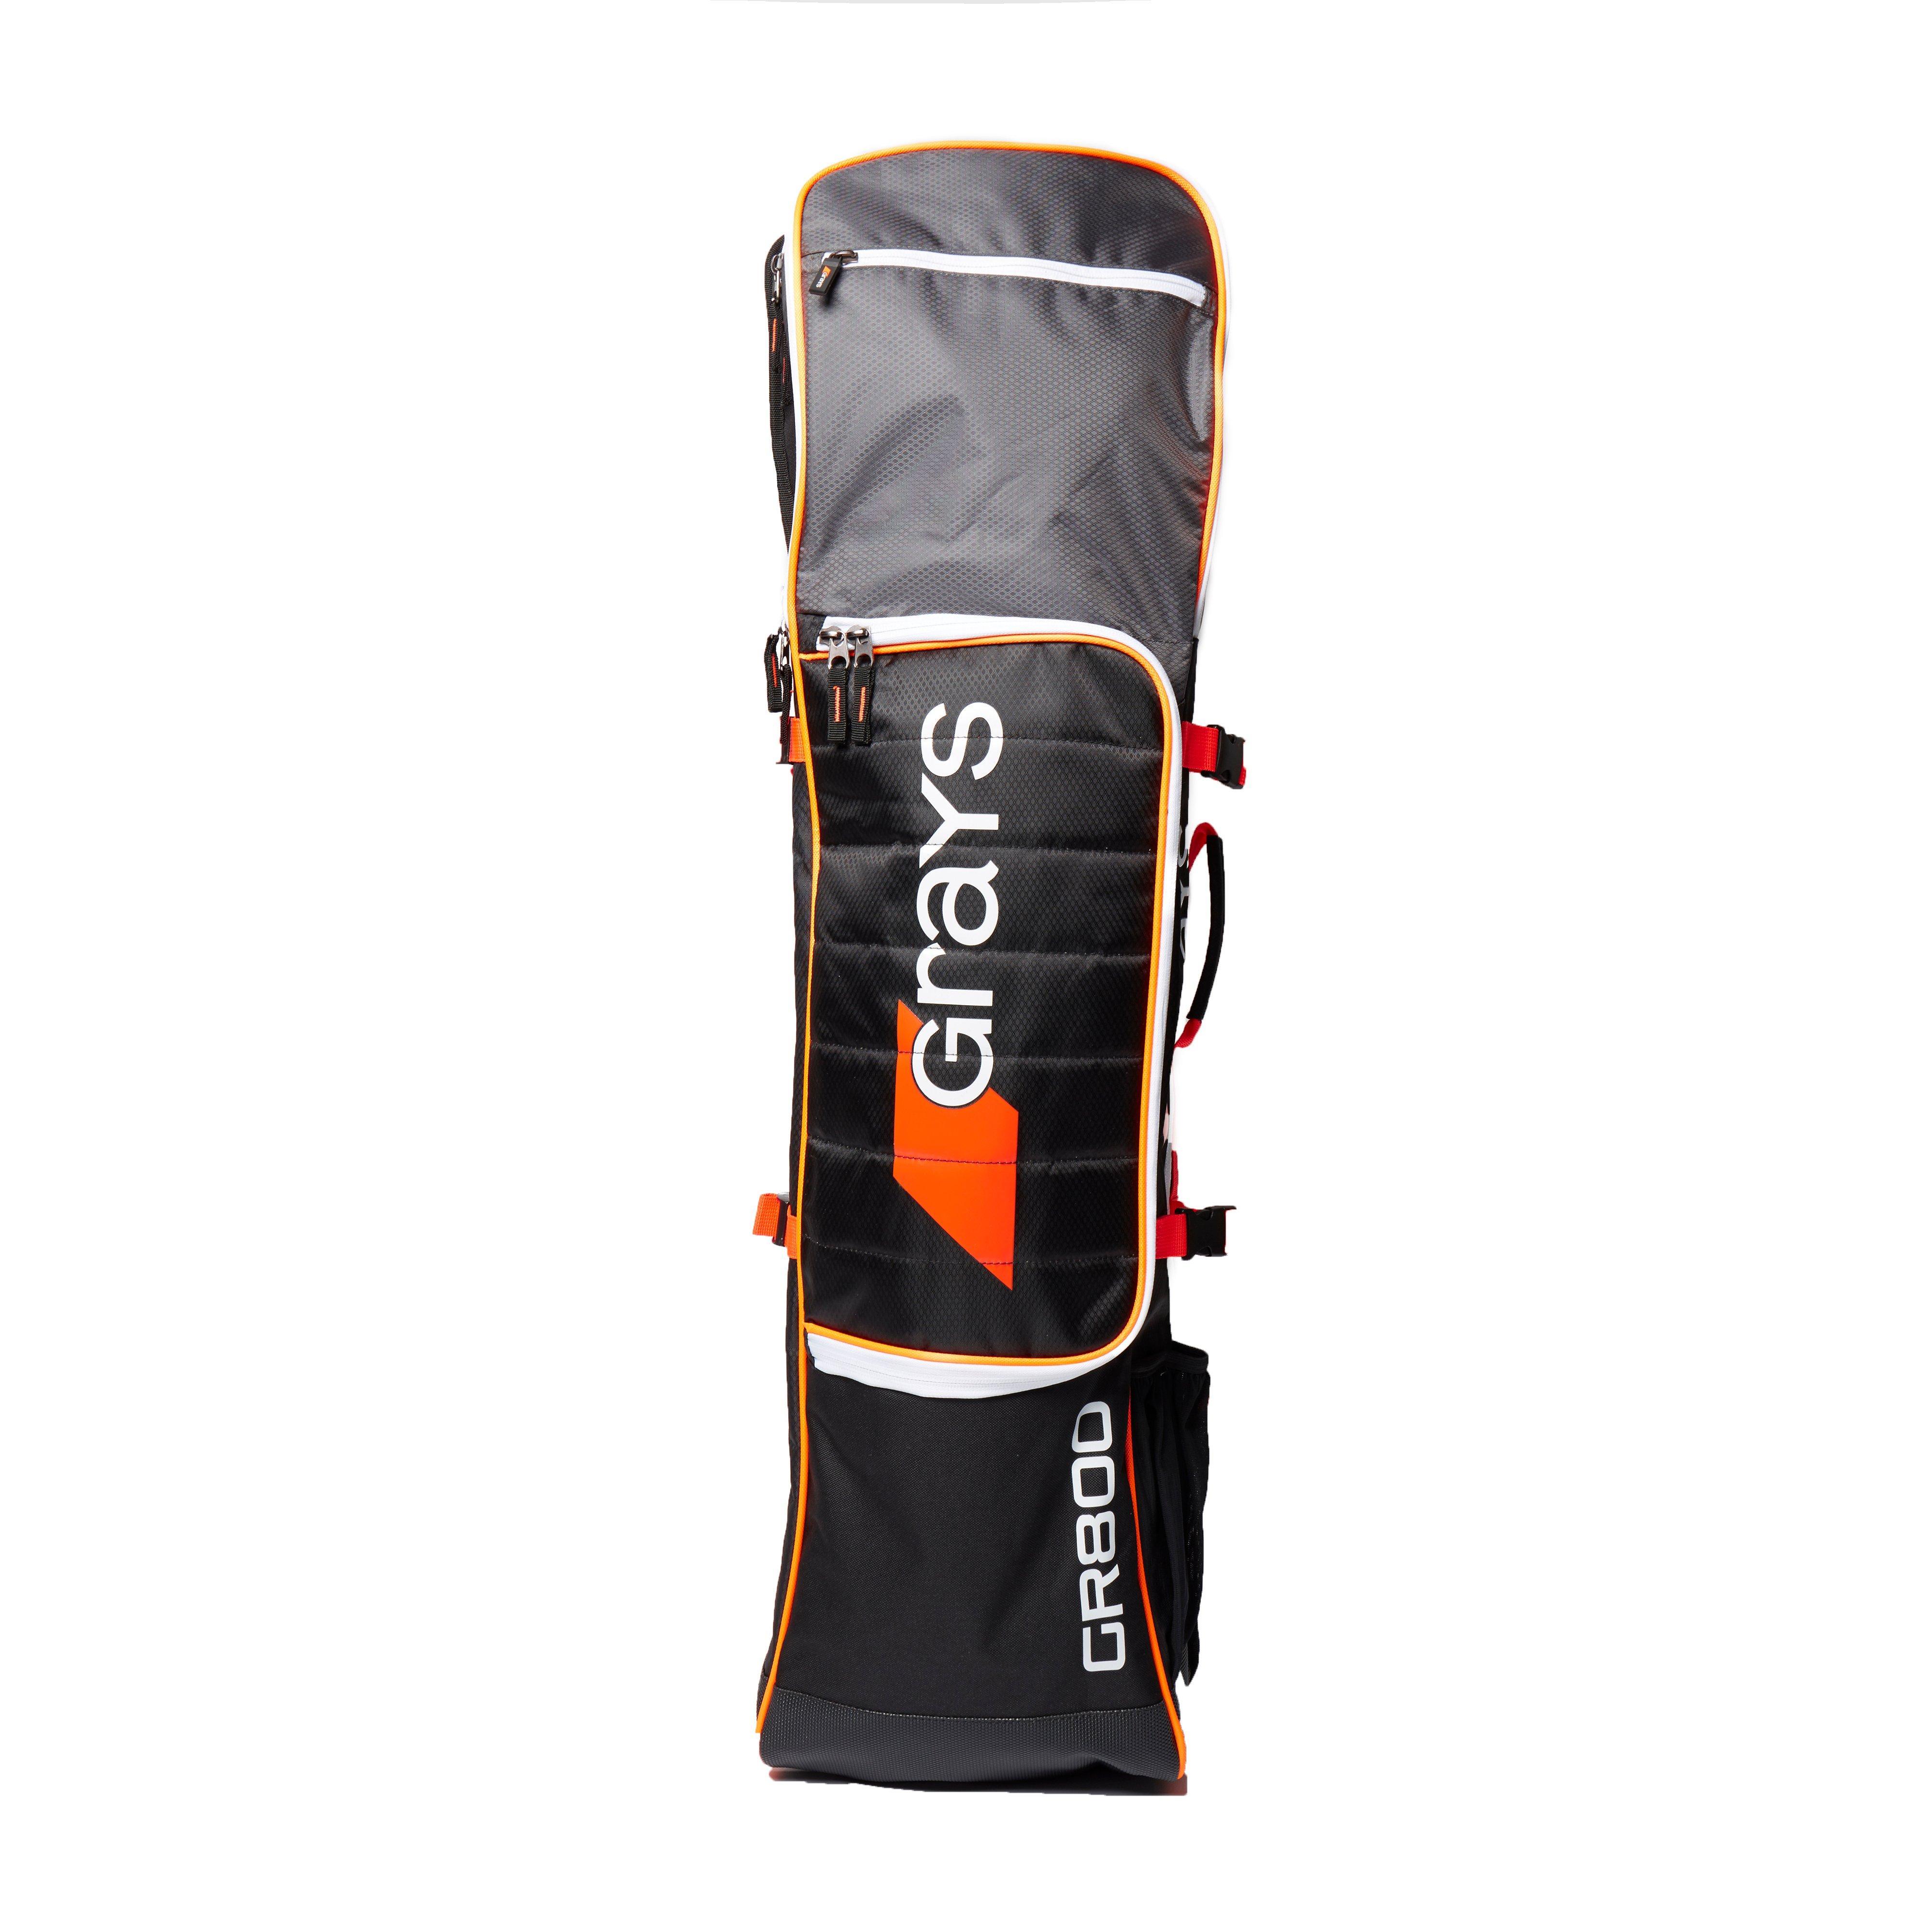 d0112c6a2d Details about New Grays Gr800 Stick Bag Hockey Equipment Training Sports  Kit Bag Black